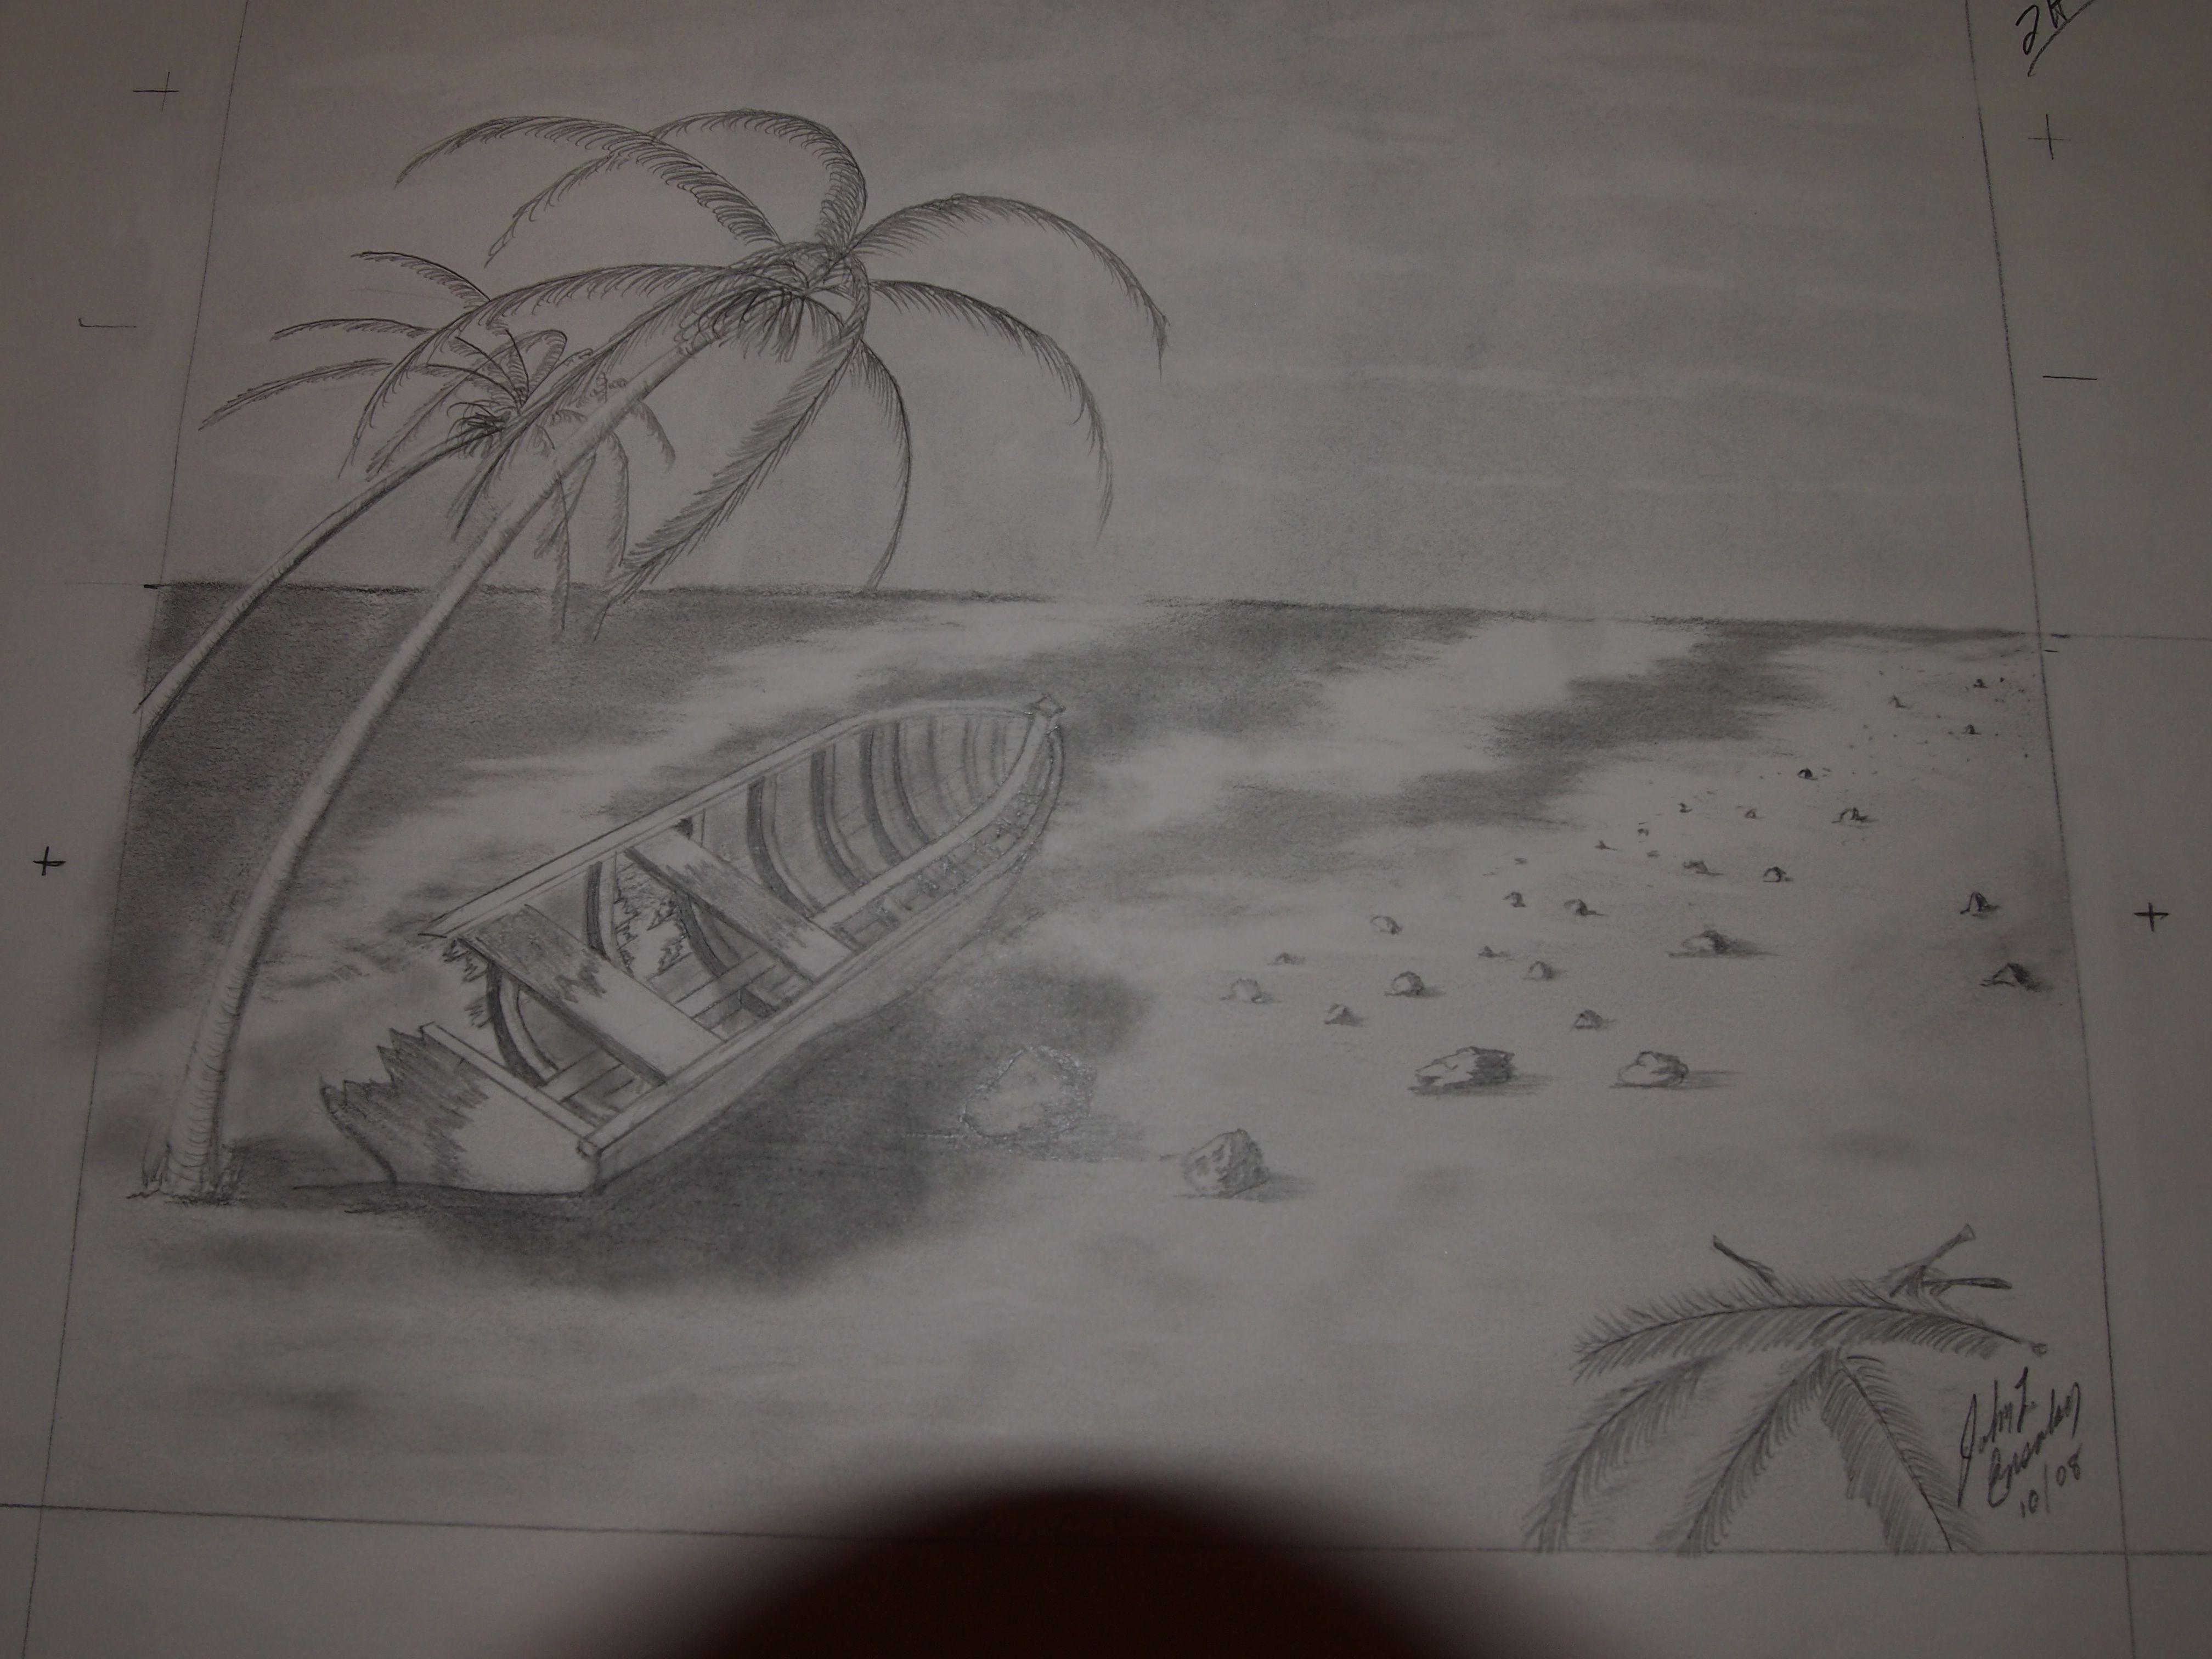 Solitude original drawing by john ensalaco pencil drawings colored pencils graphite